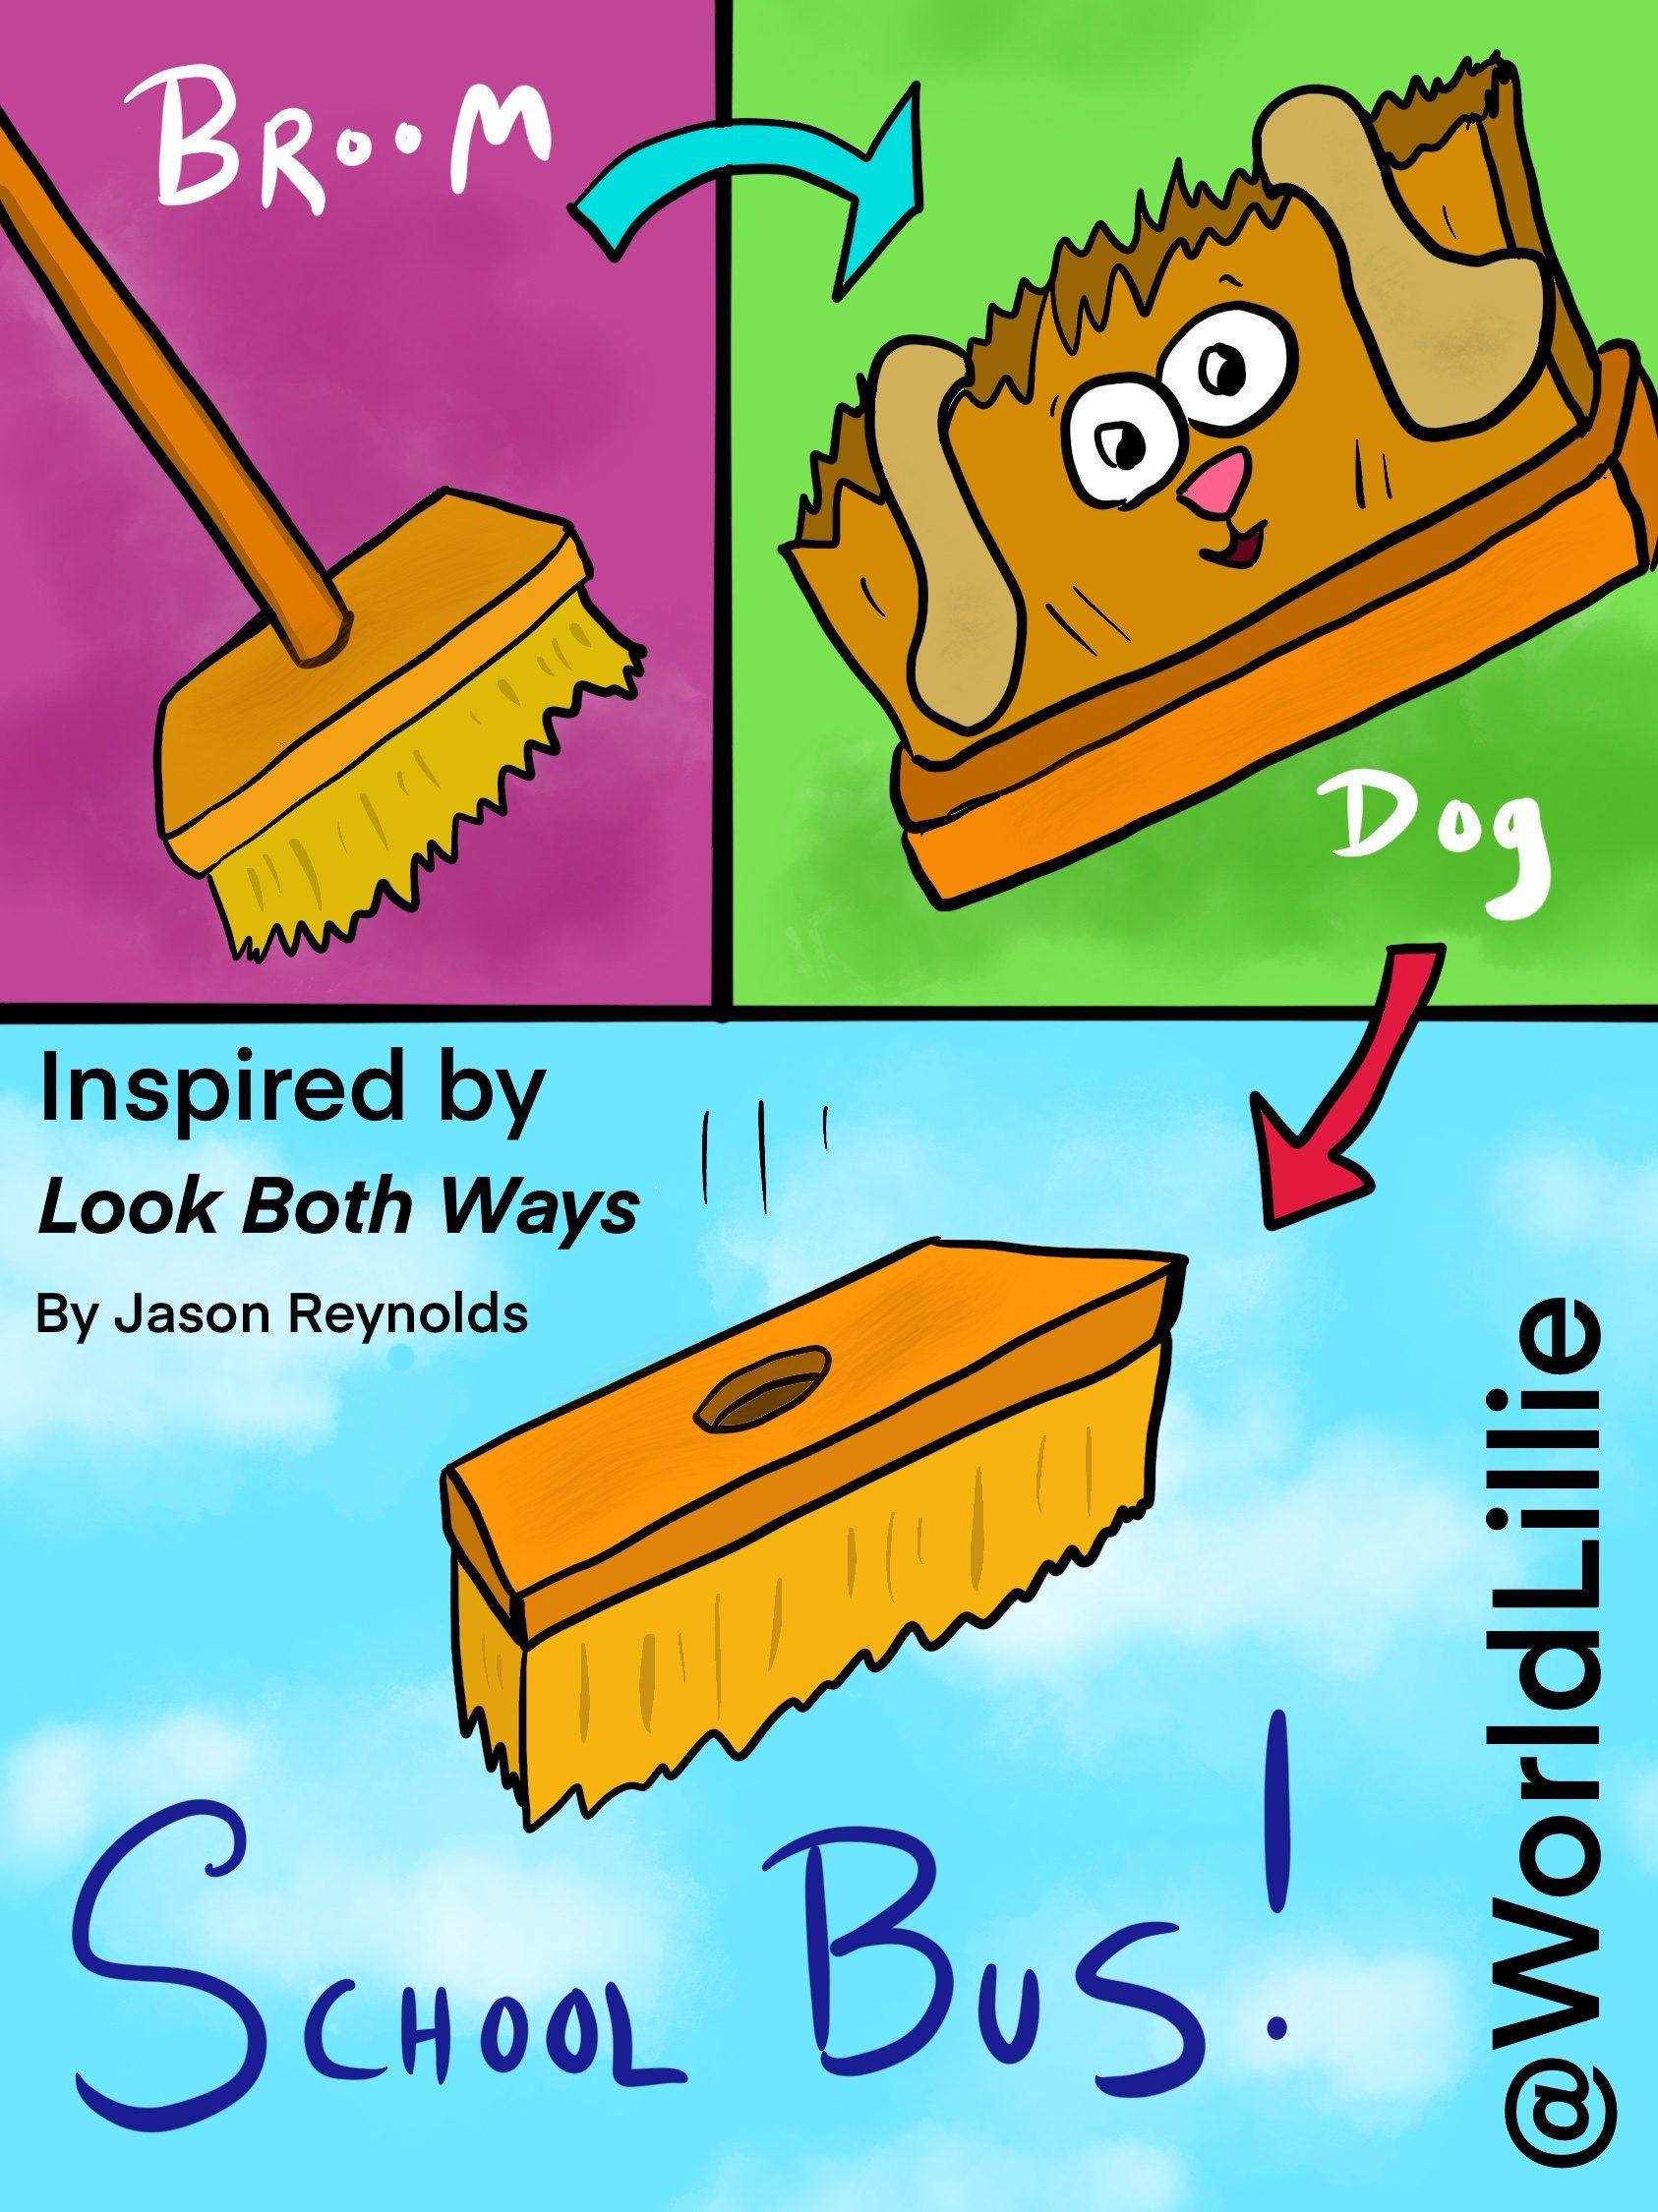 Look Both Ways by Jason Reynolds: School bus that fell from the sky cartoon.